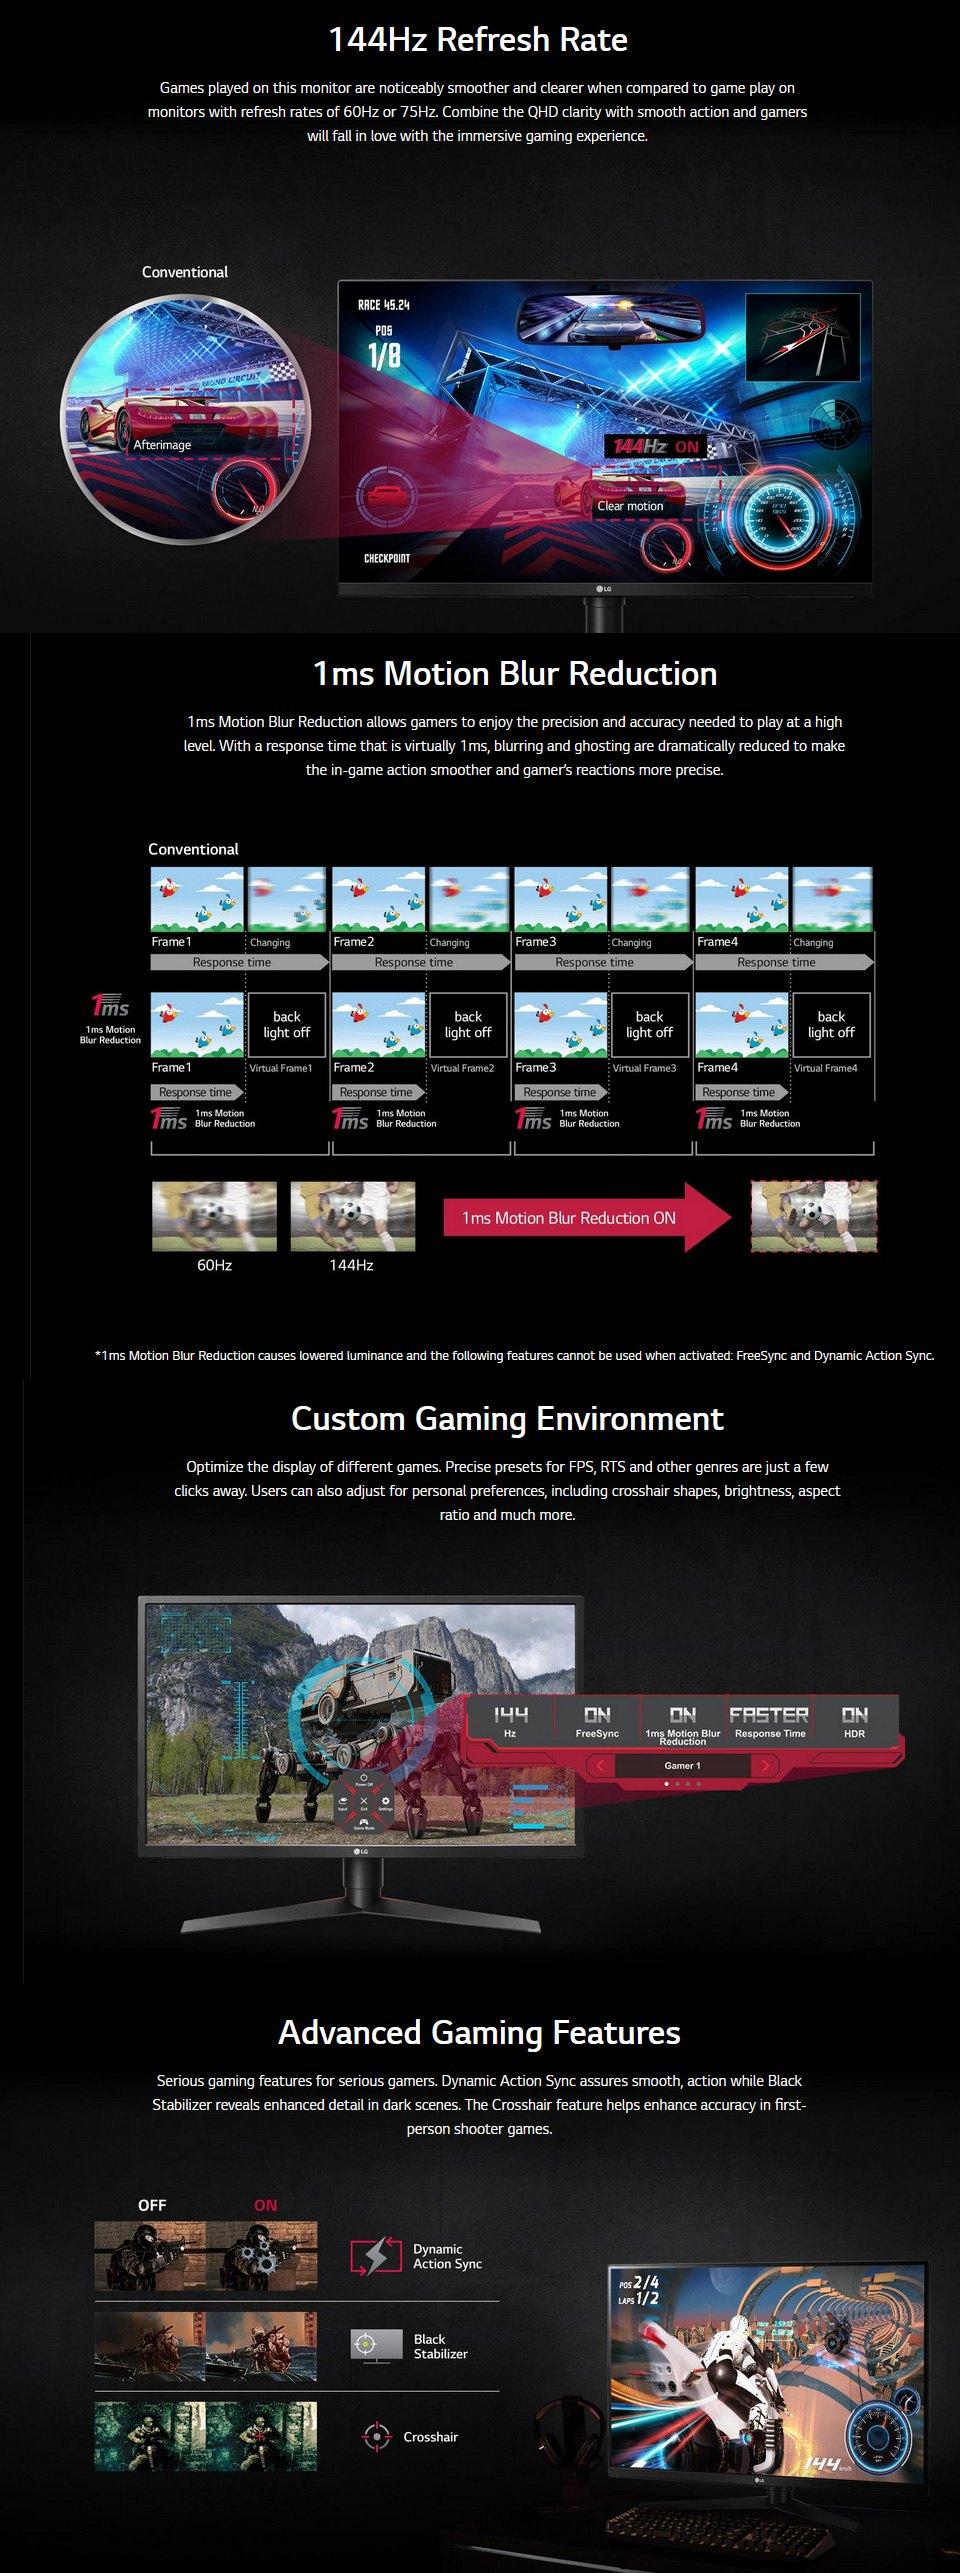 LG UltraGear 144Hz QHD 32in Monitor features 2